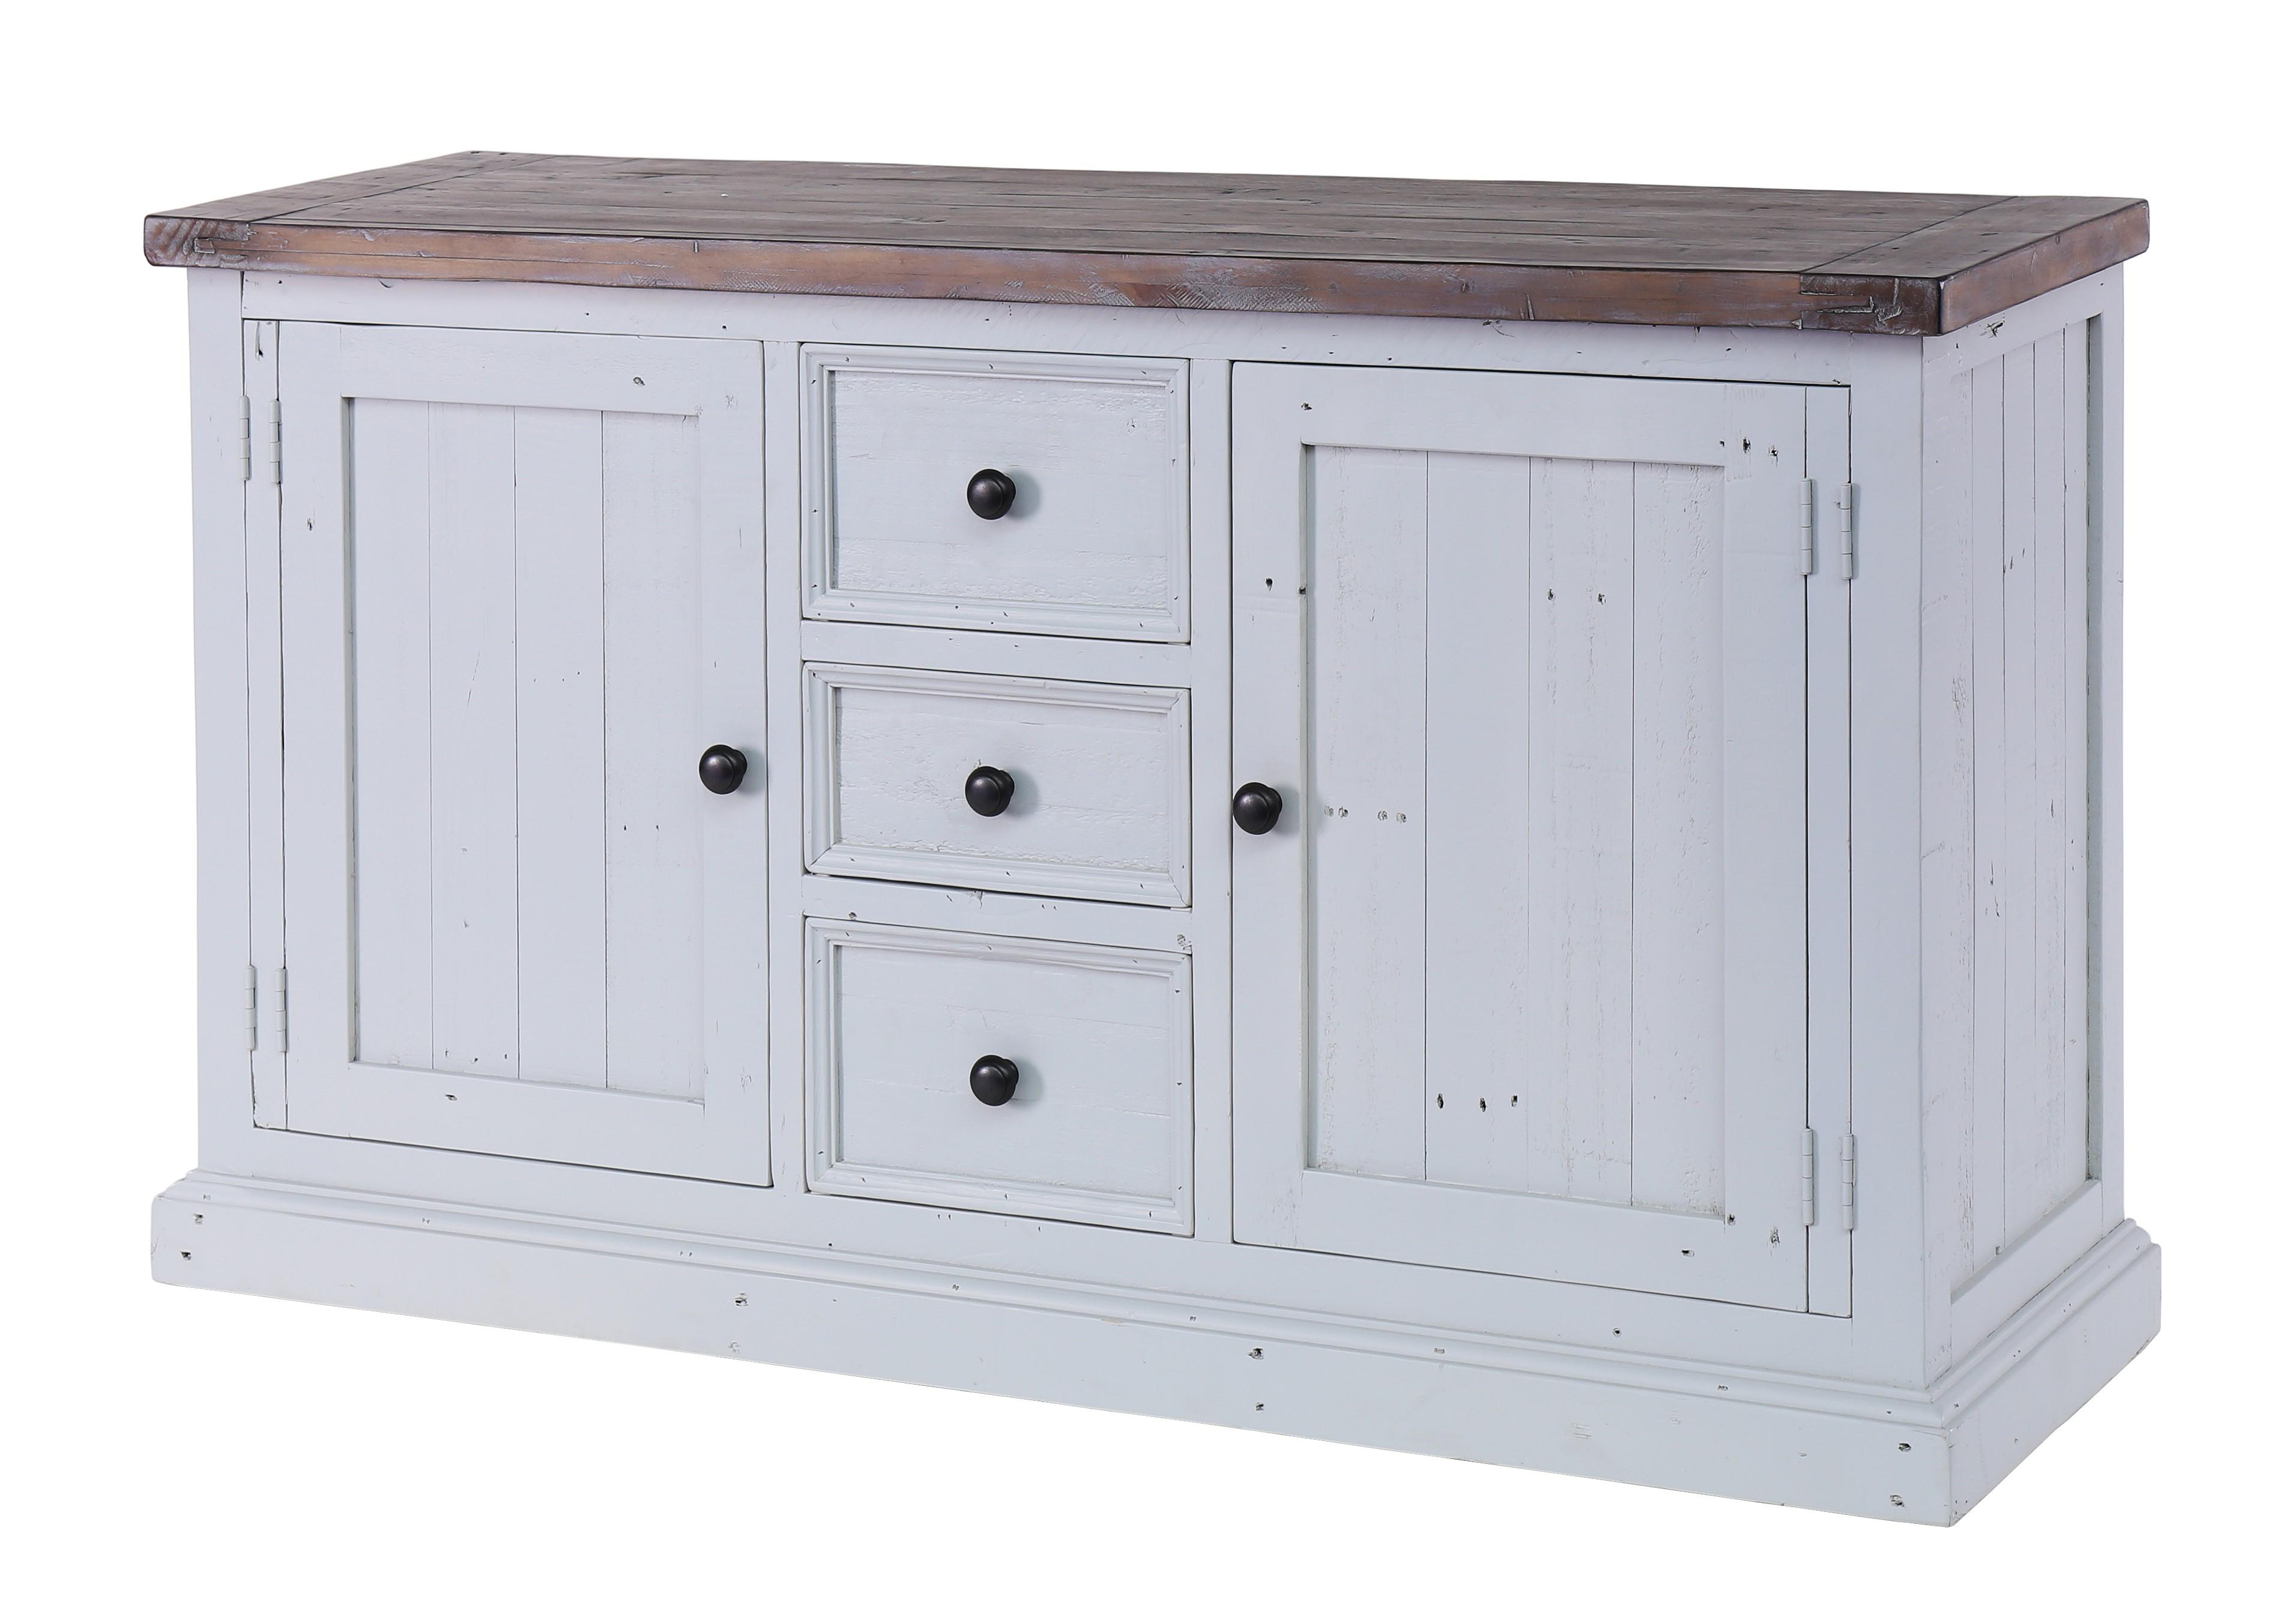 Besp Oak Hampton Wide Sideboard – 2 Doors, 3 Drawers – Style Our Home Regarding Most Recent Aged Pine 3 Drawer 2 Door Sideboards (Gallery 4 of 20)